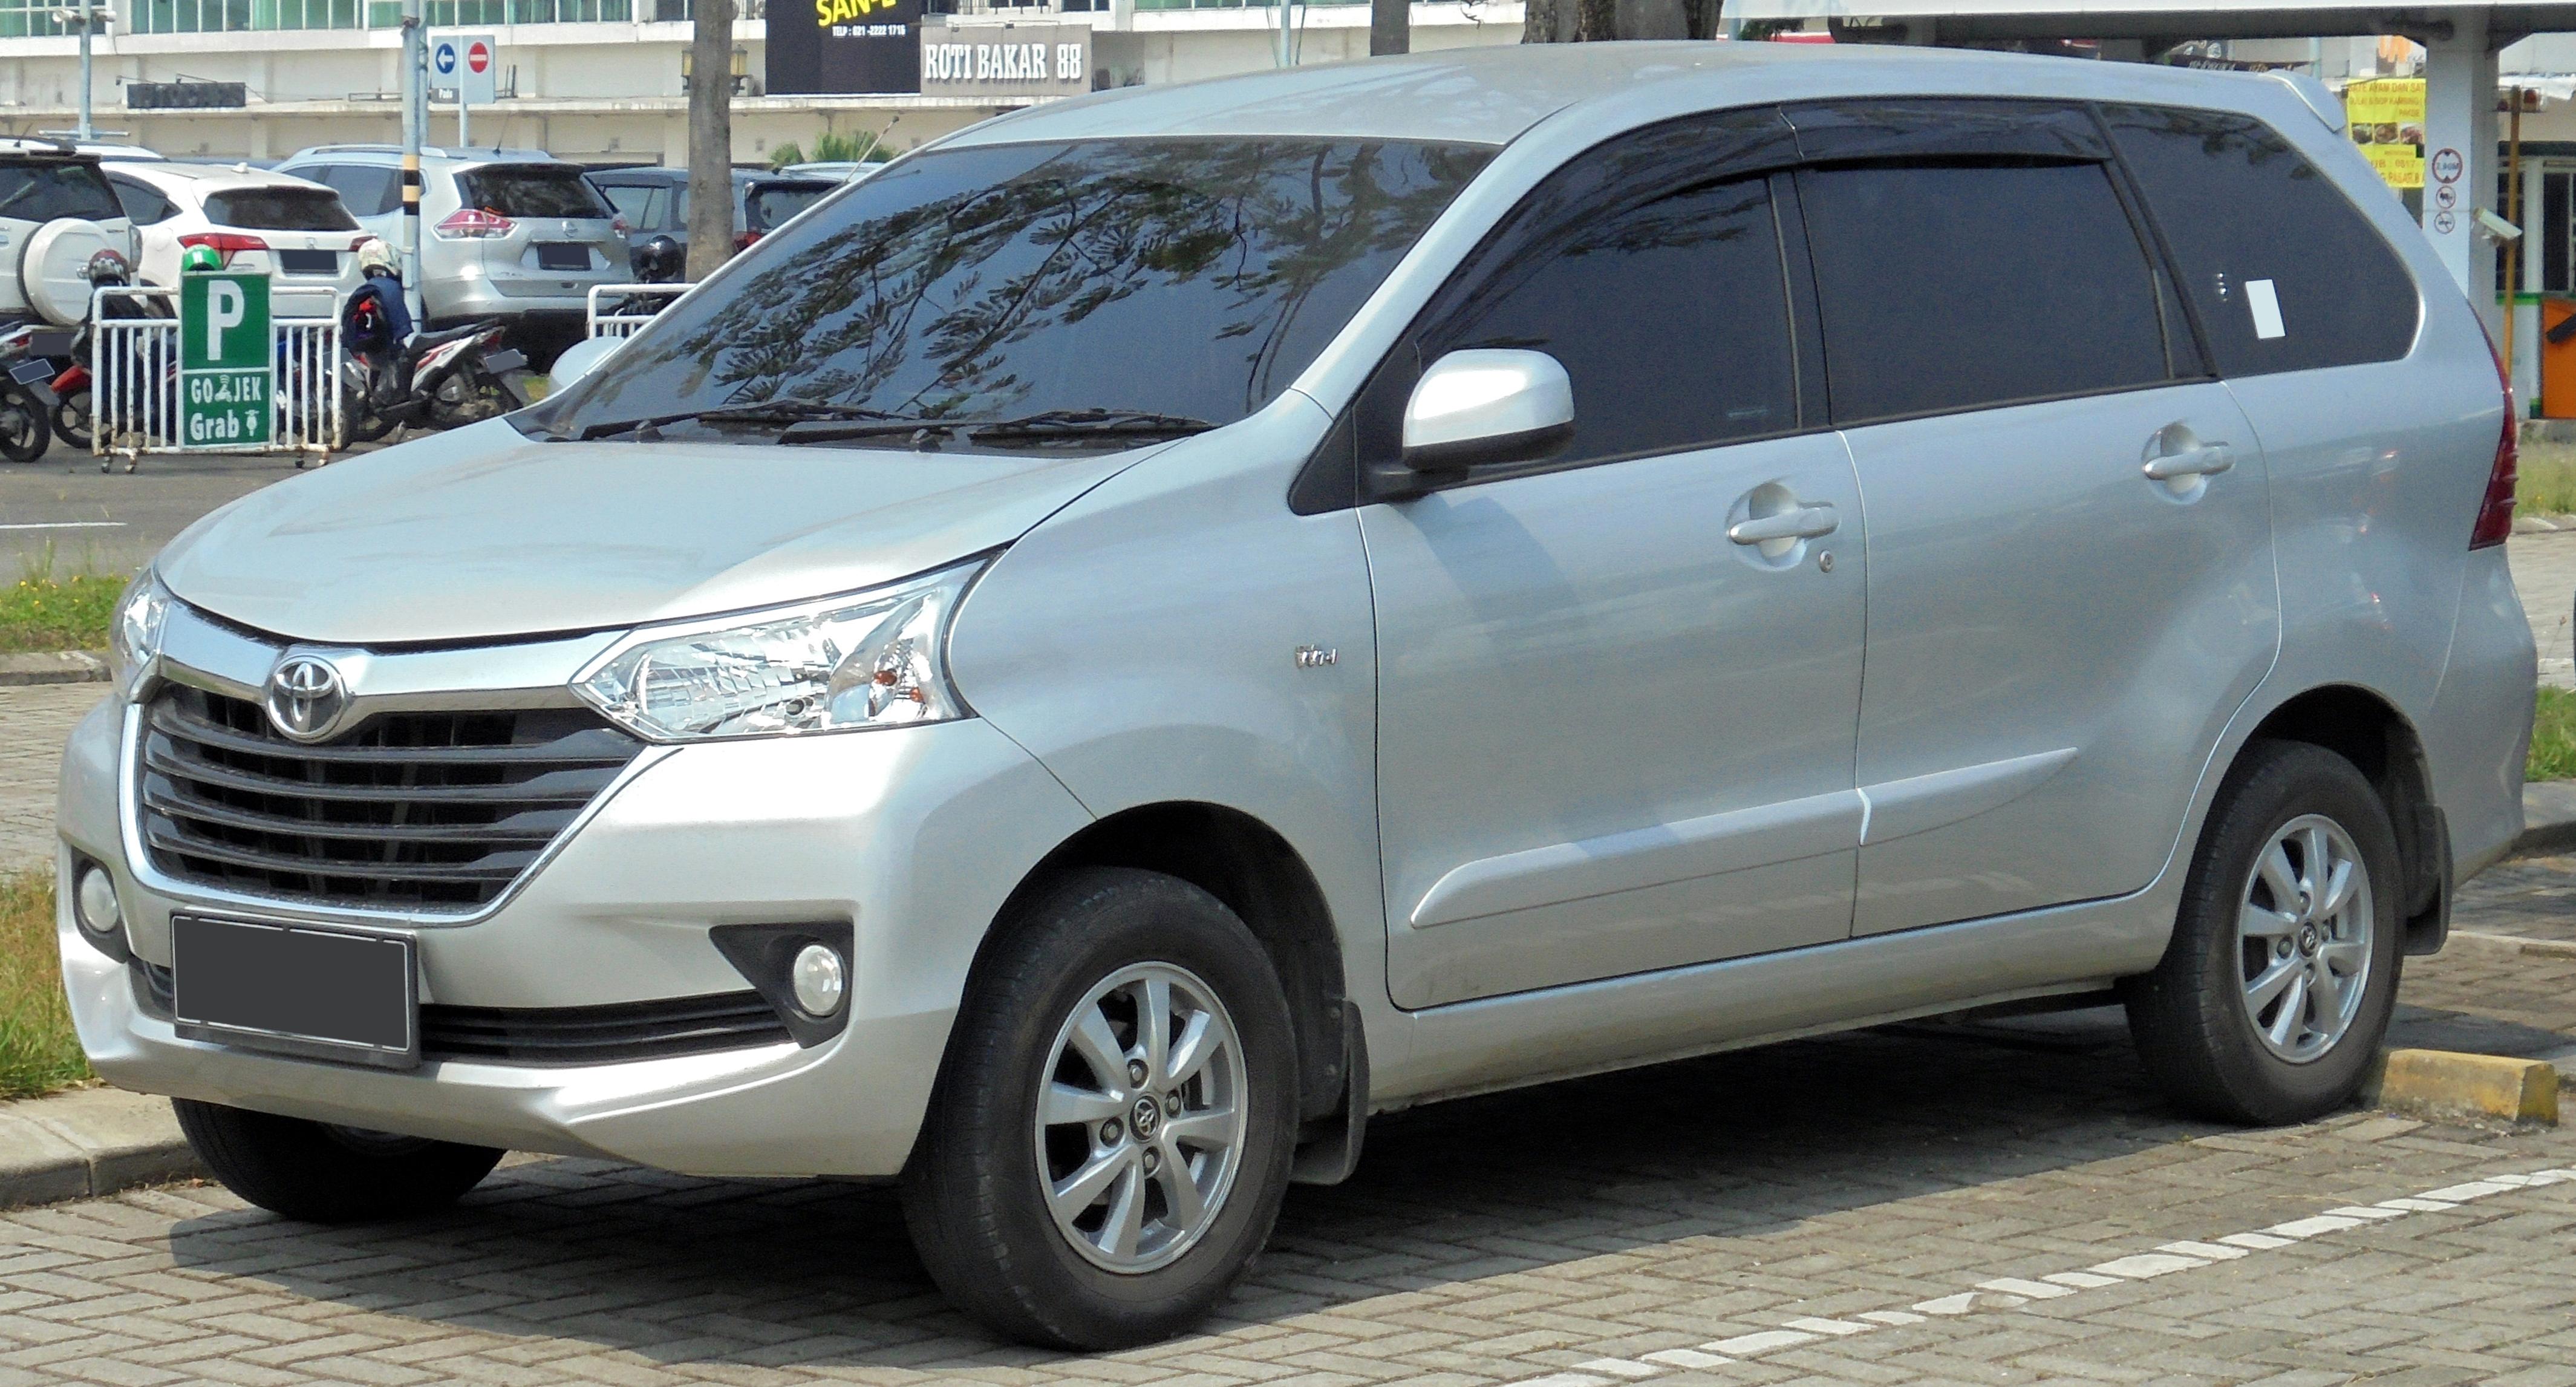 Kelebihan Toyota Avanza 2018 Spesifikasi